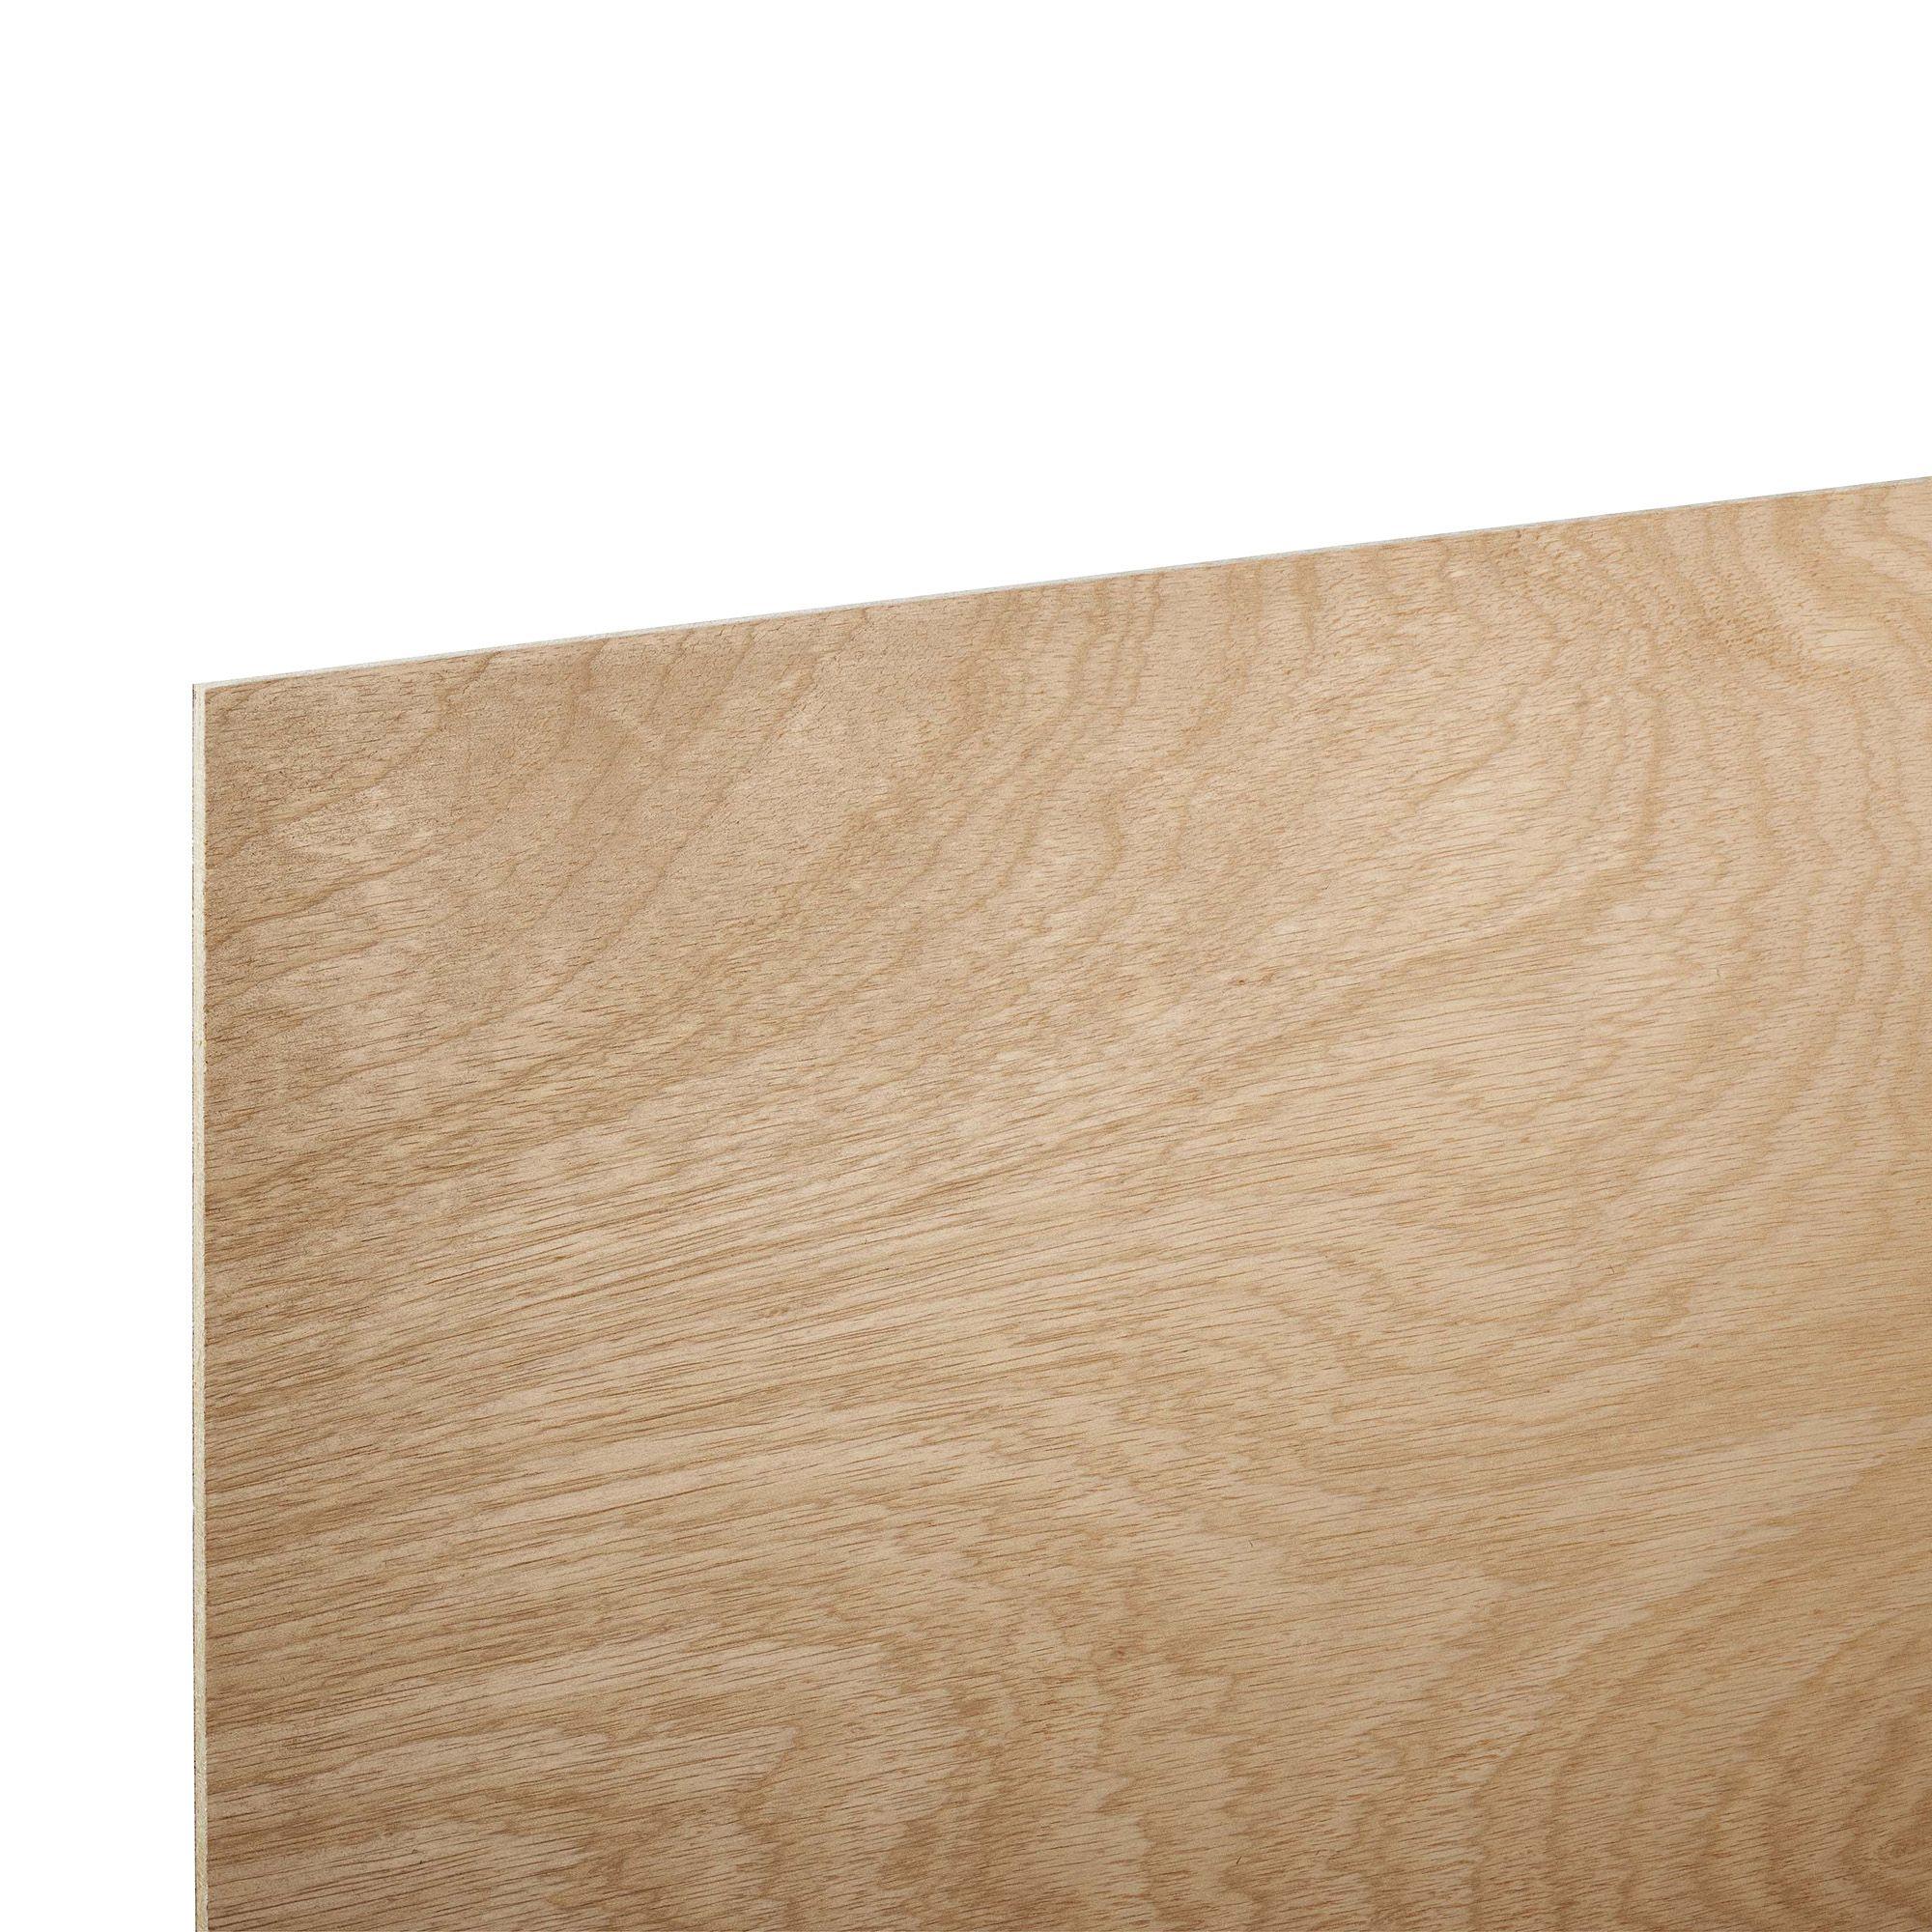 Exterior Plywood 6mm ~ Wbp exterior plywood mm